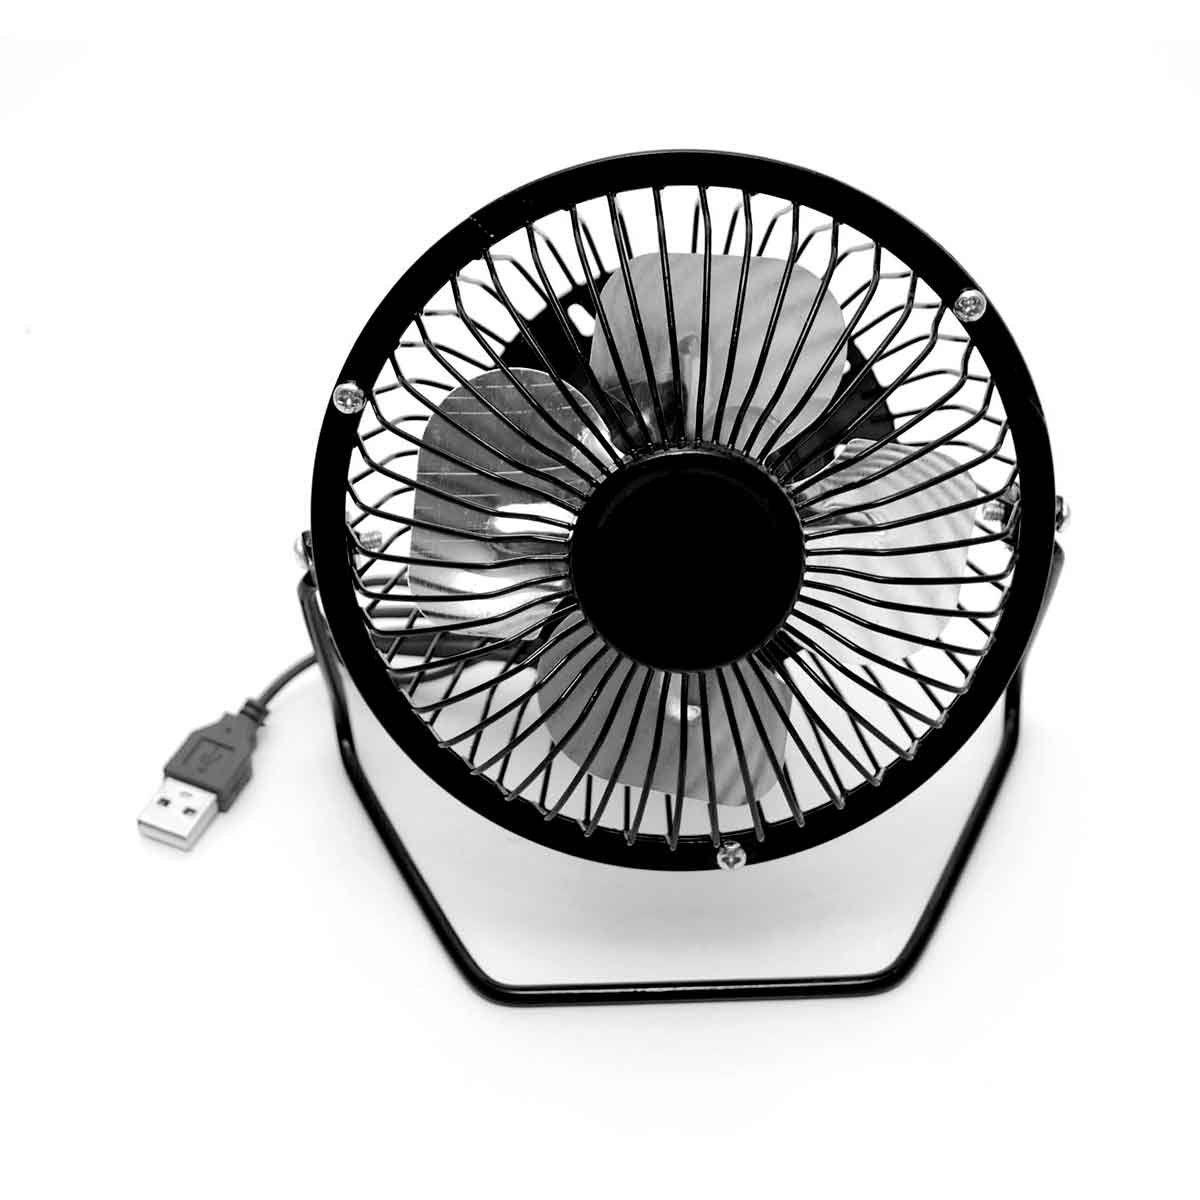 Mini Ventilador Usb De Mesa Portátil Silencioso Preto